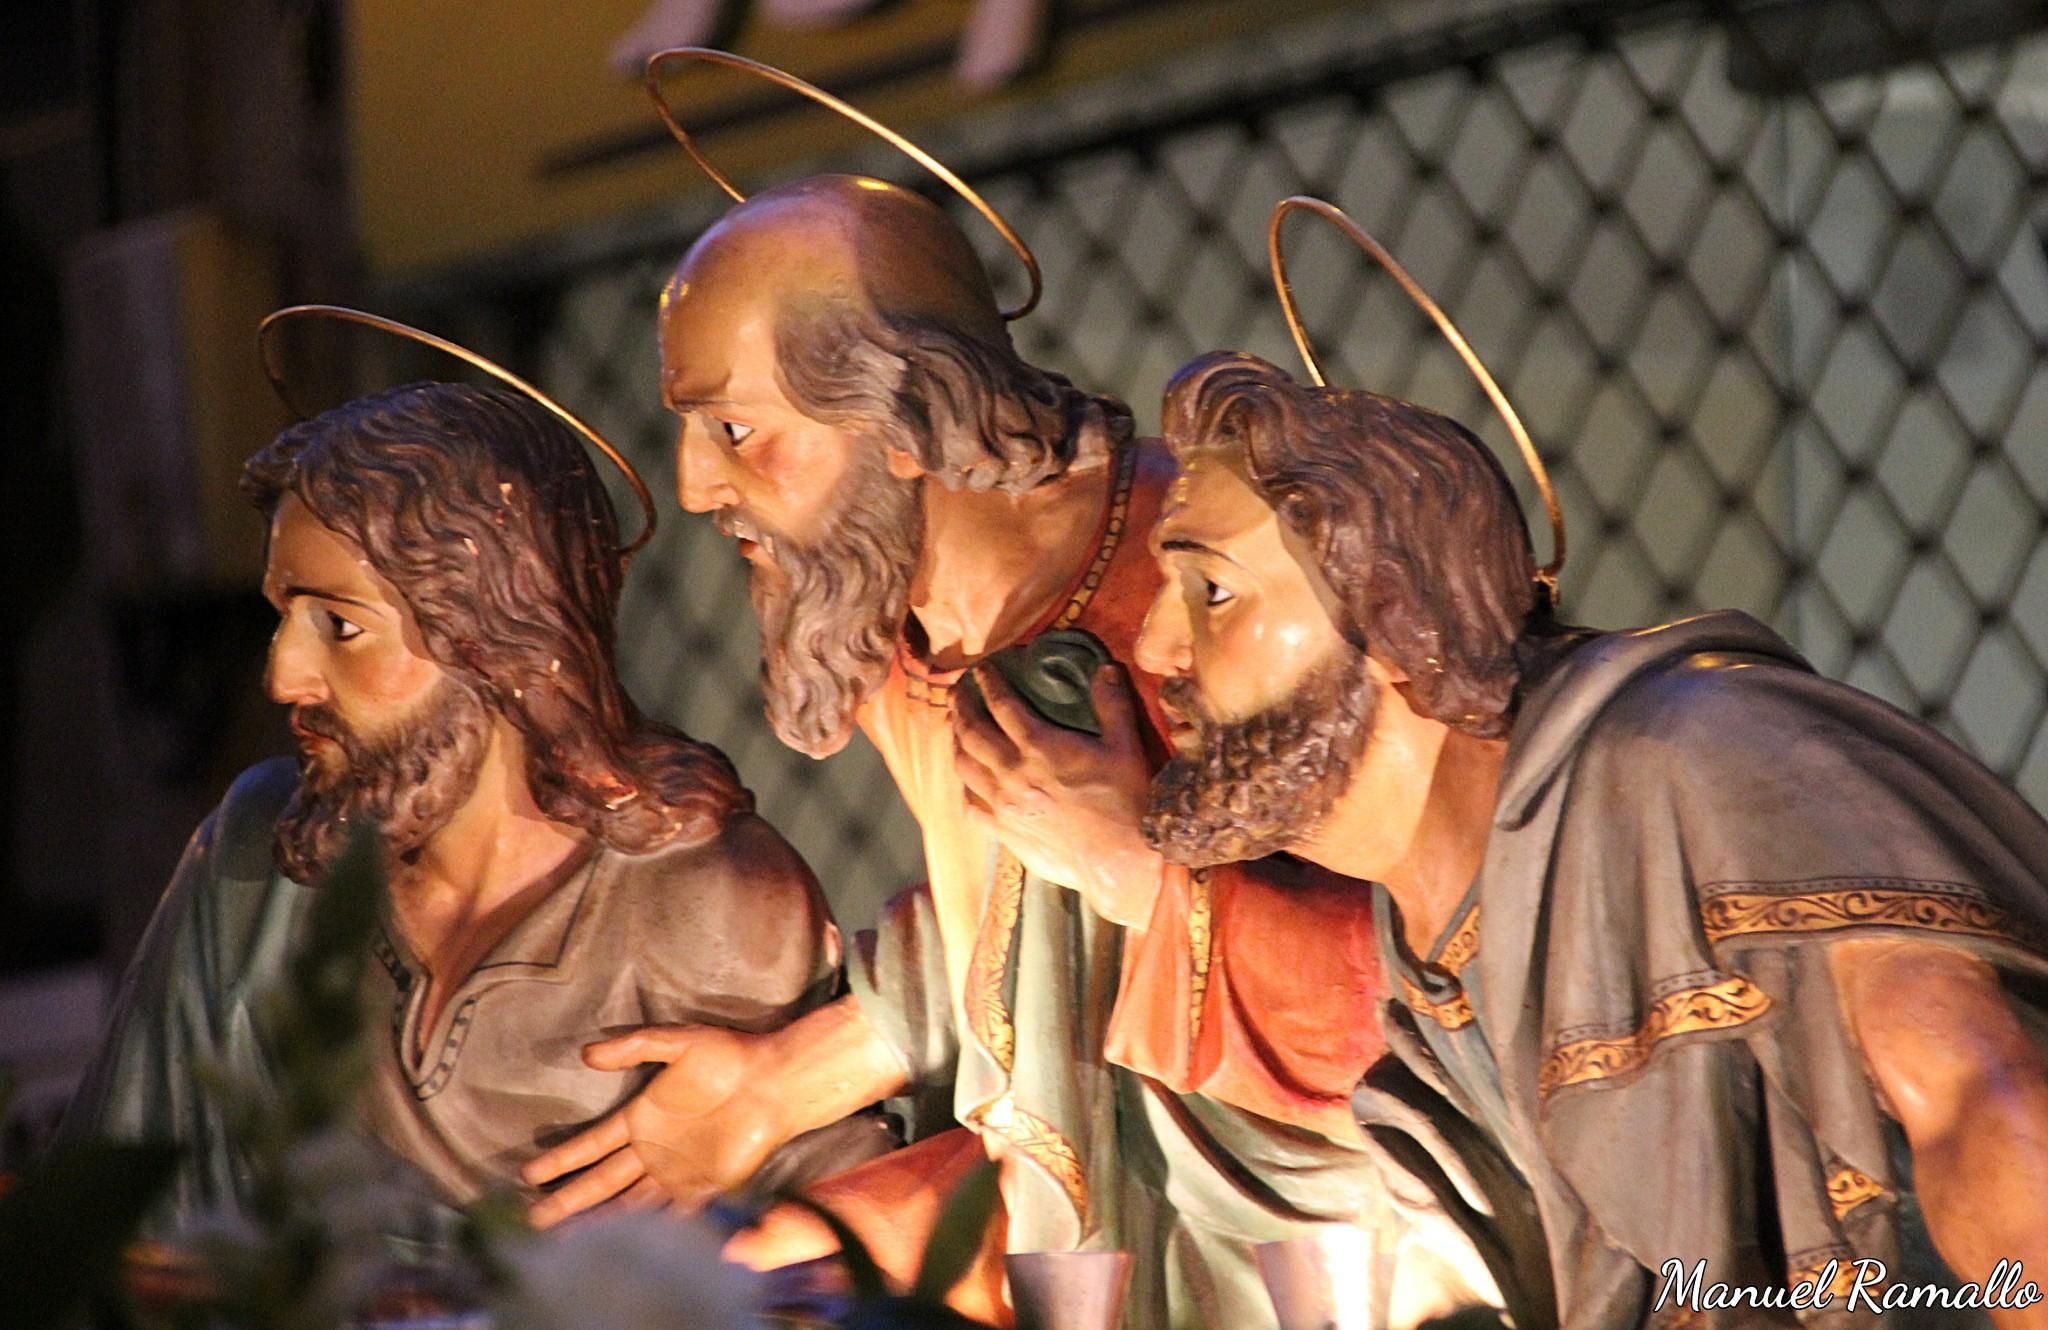 ultima-cena-procesion-viernes-santo-ourense-orense